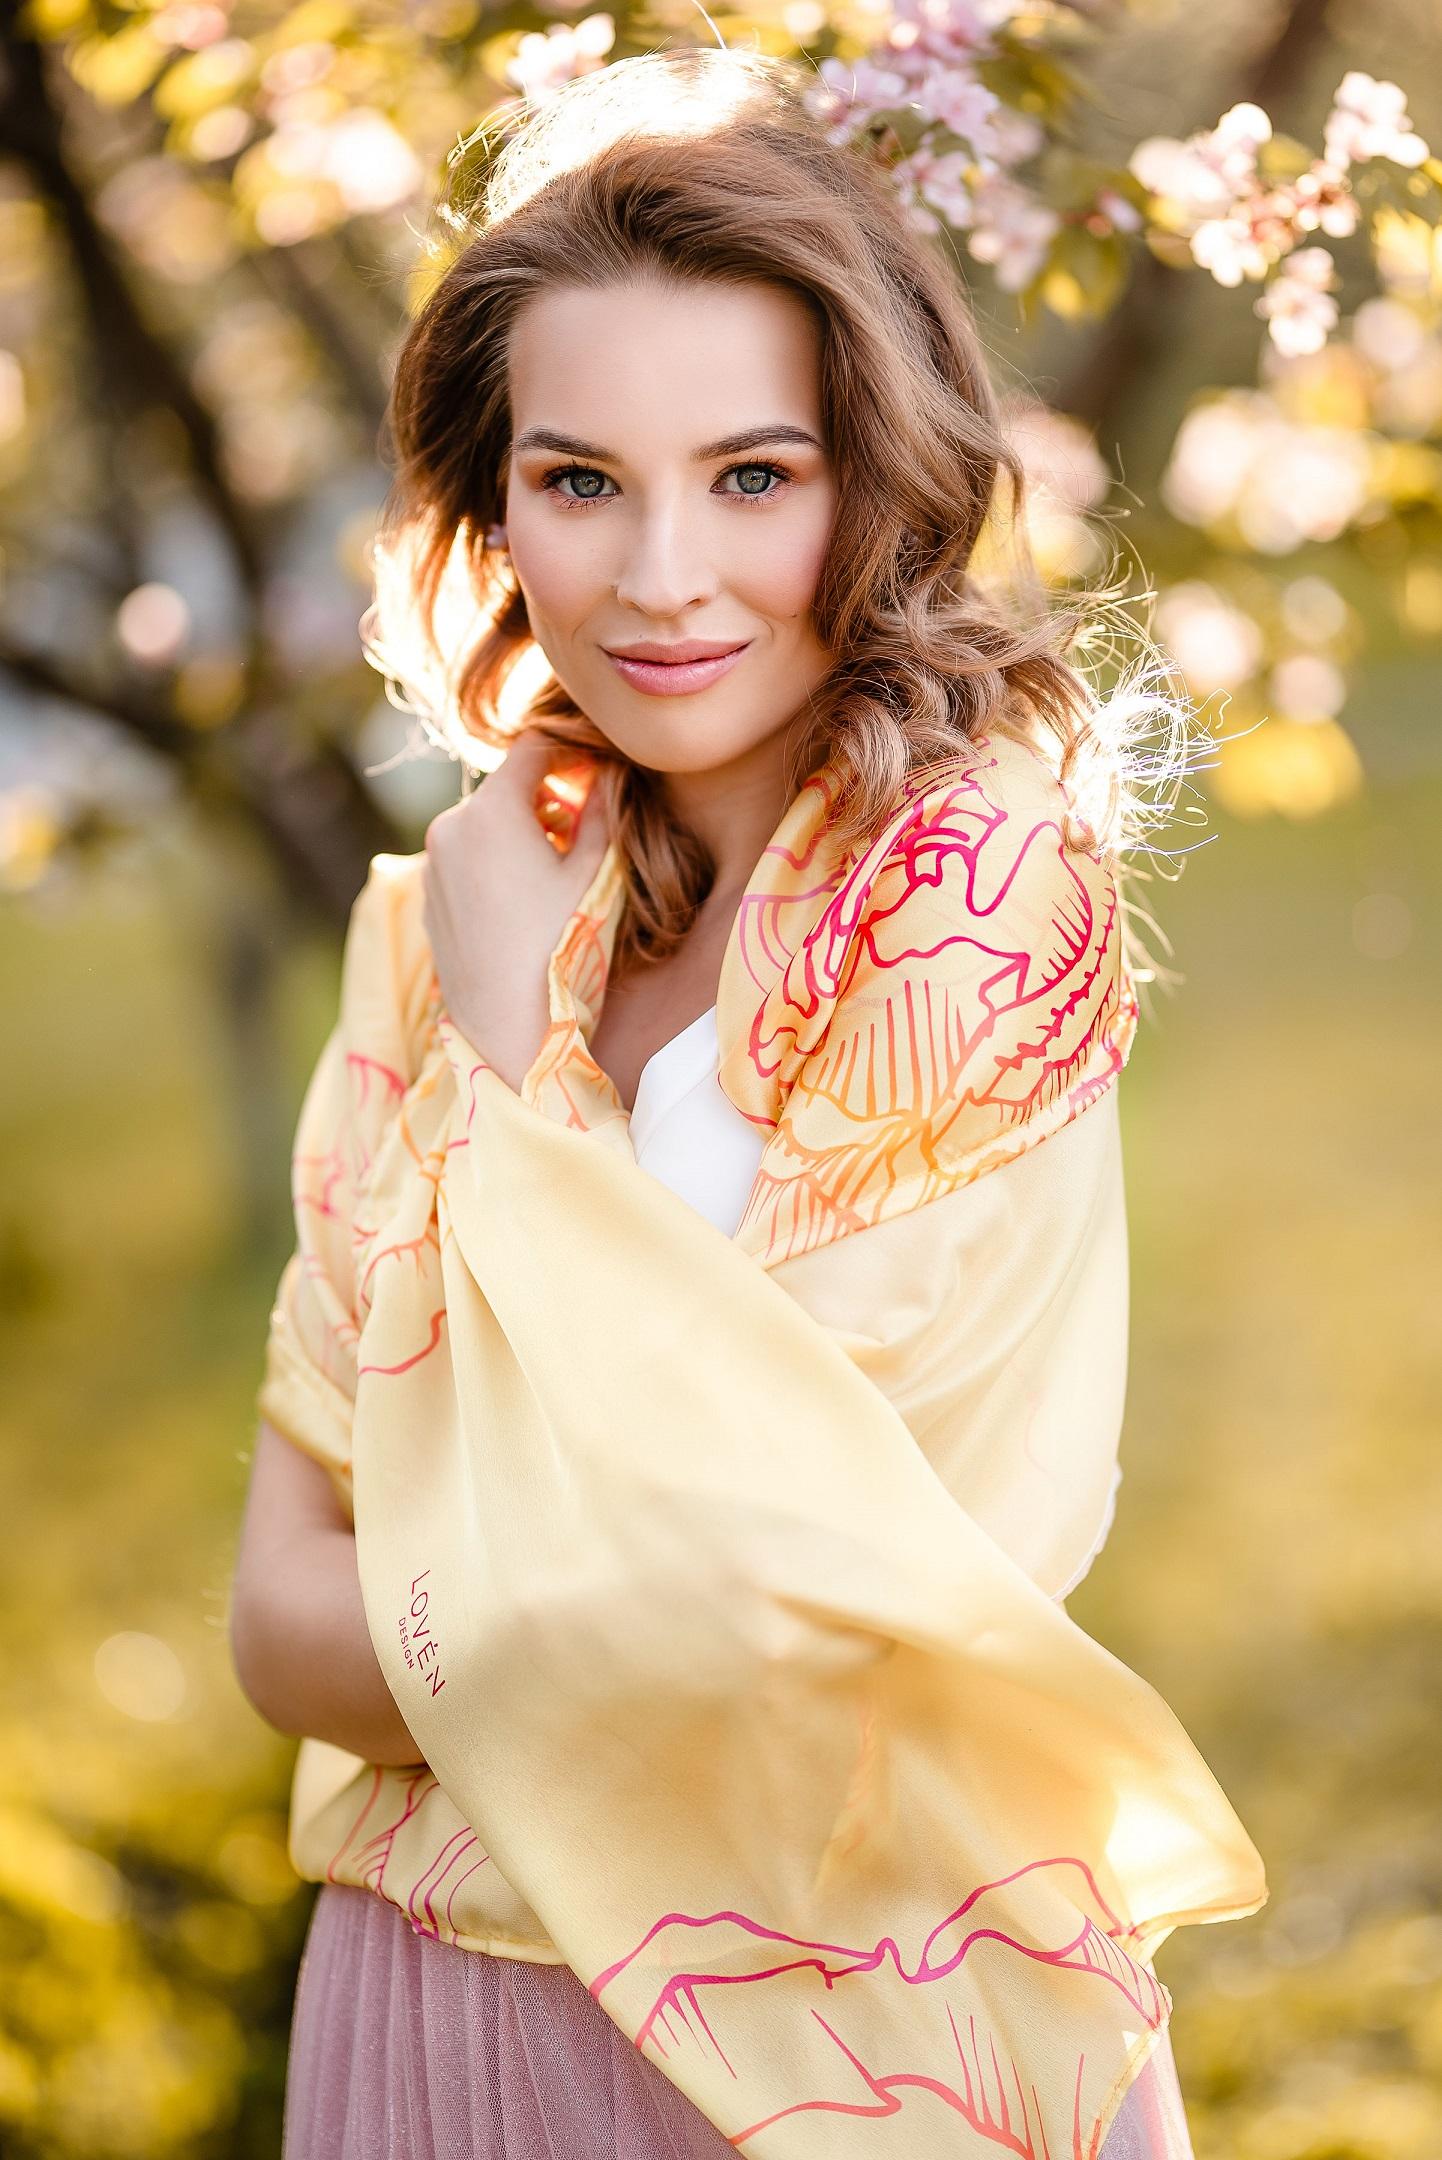 eco-friendly yellow scarf